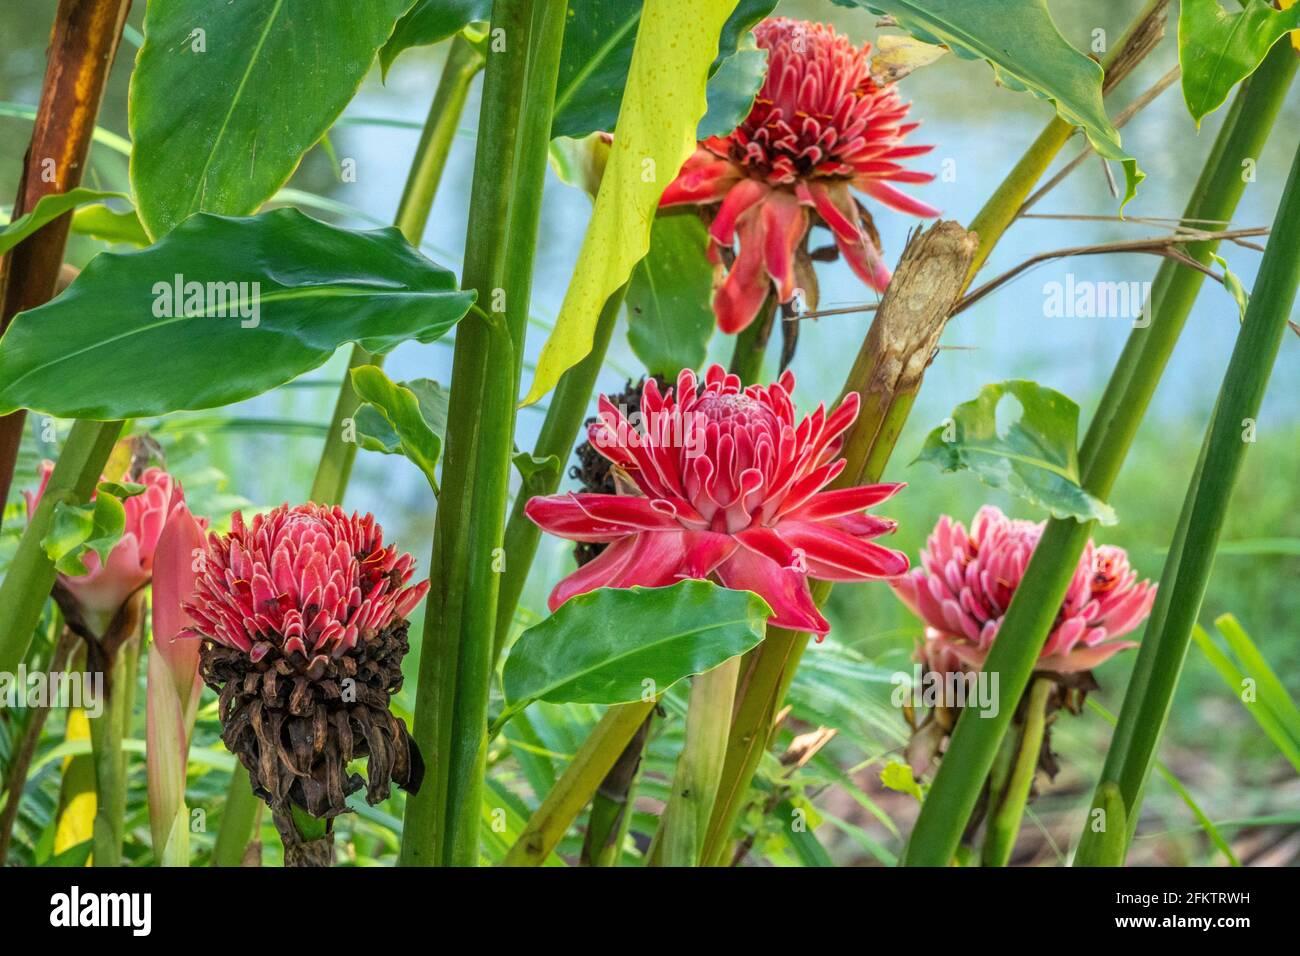 Red torch ginger (Etlingera elatior) flower, Abba Paradise, Taiton, Bau, Sarawak, East Malaysia Stock Photo